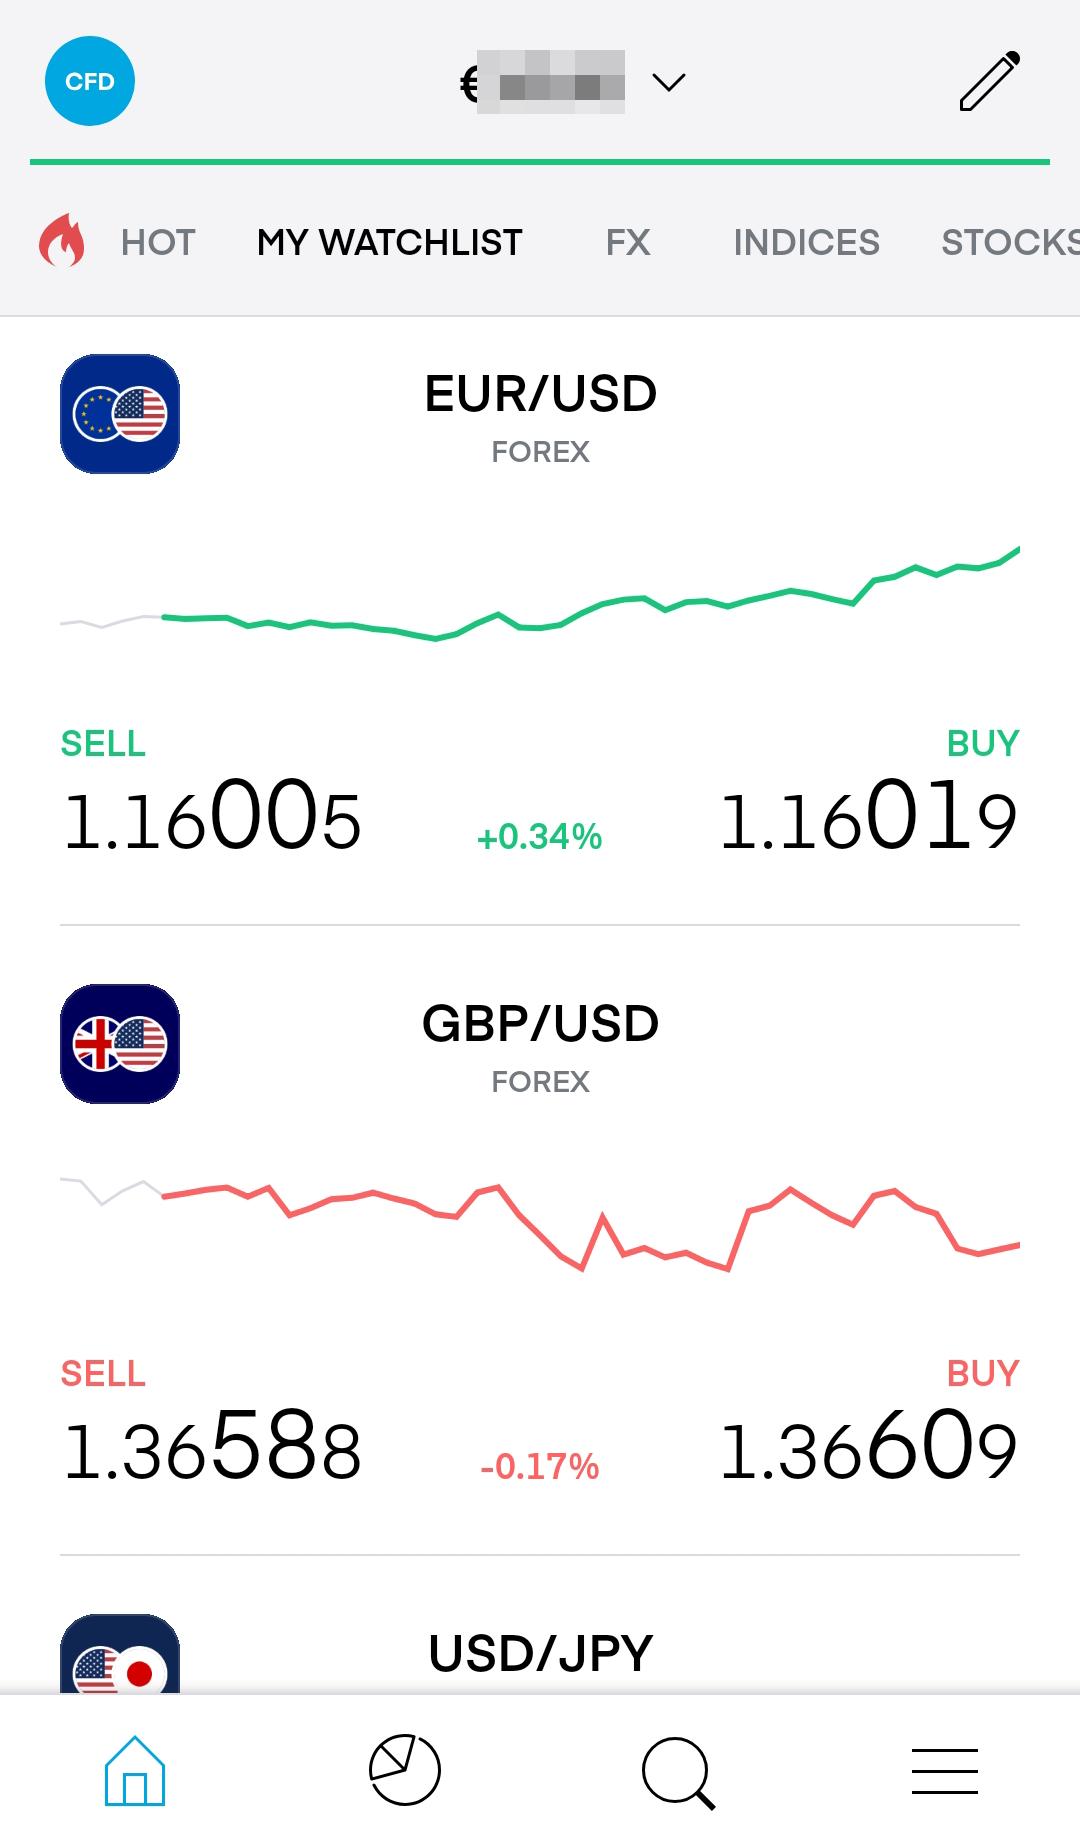 Trading 212 review - Mobile trading platform